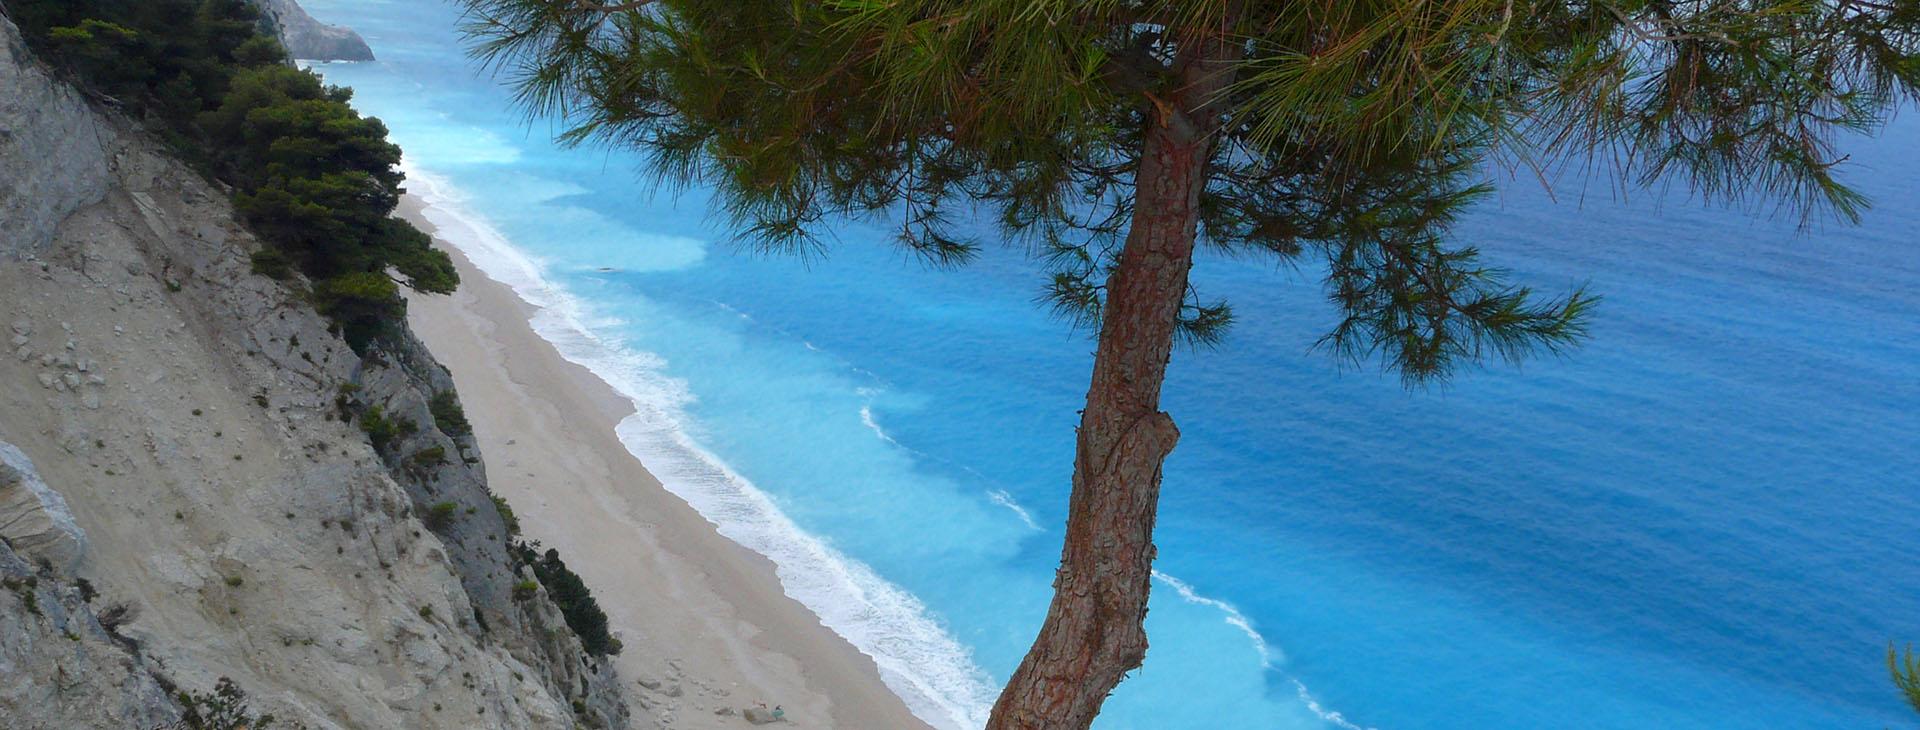 Beach at Lefkada island